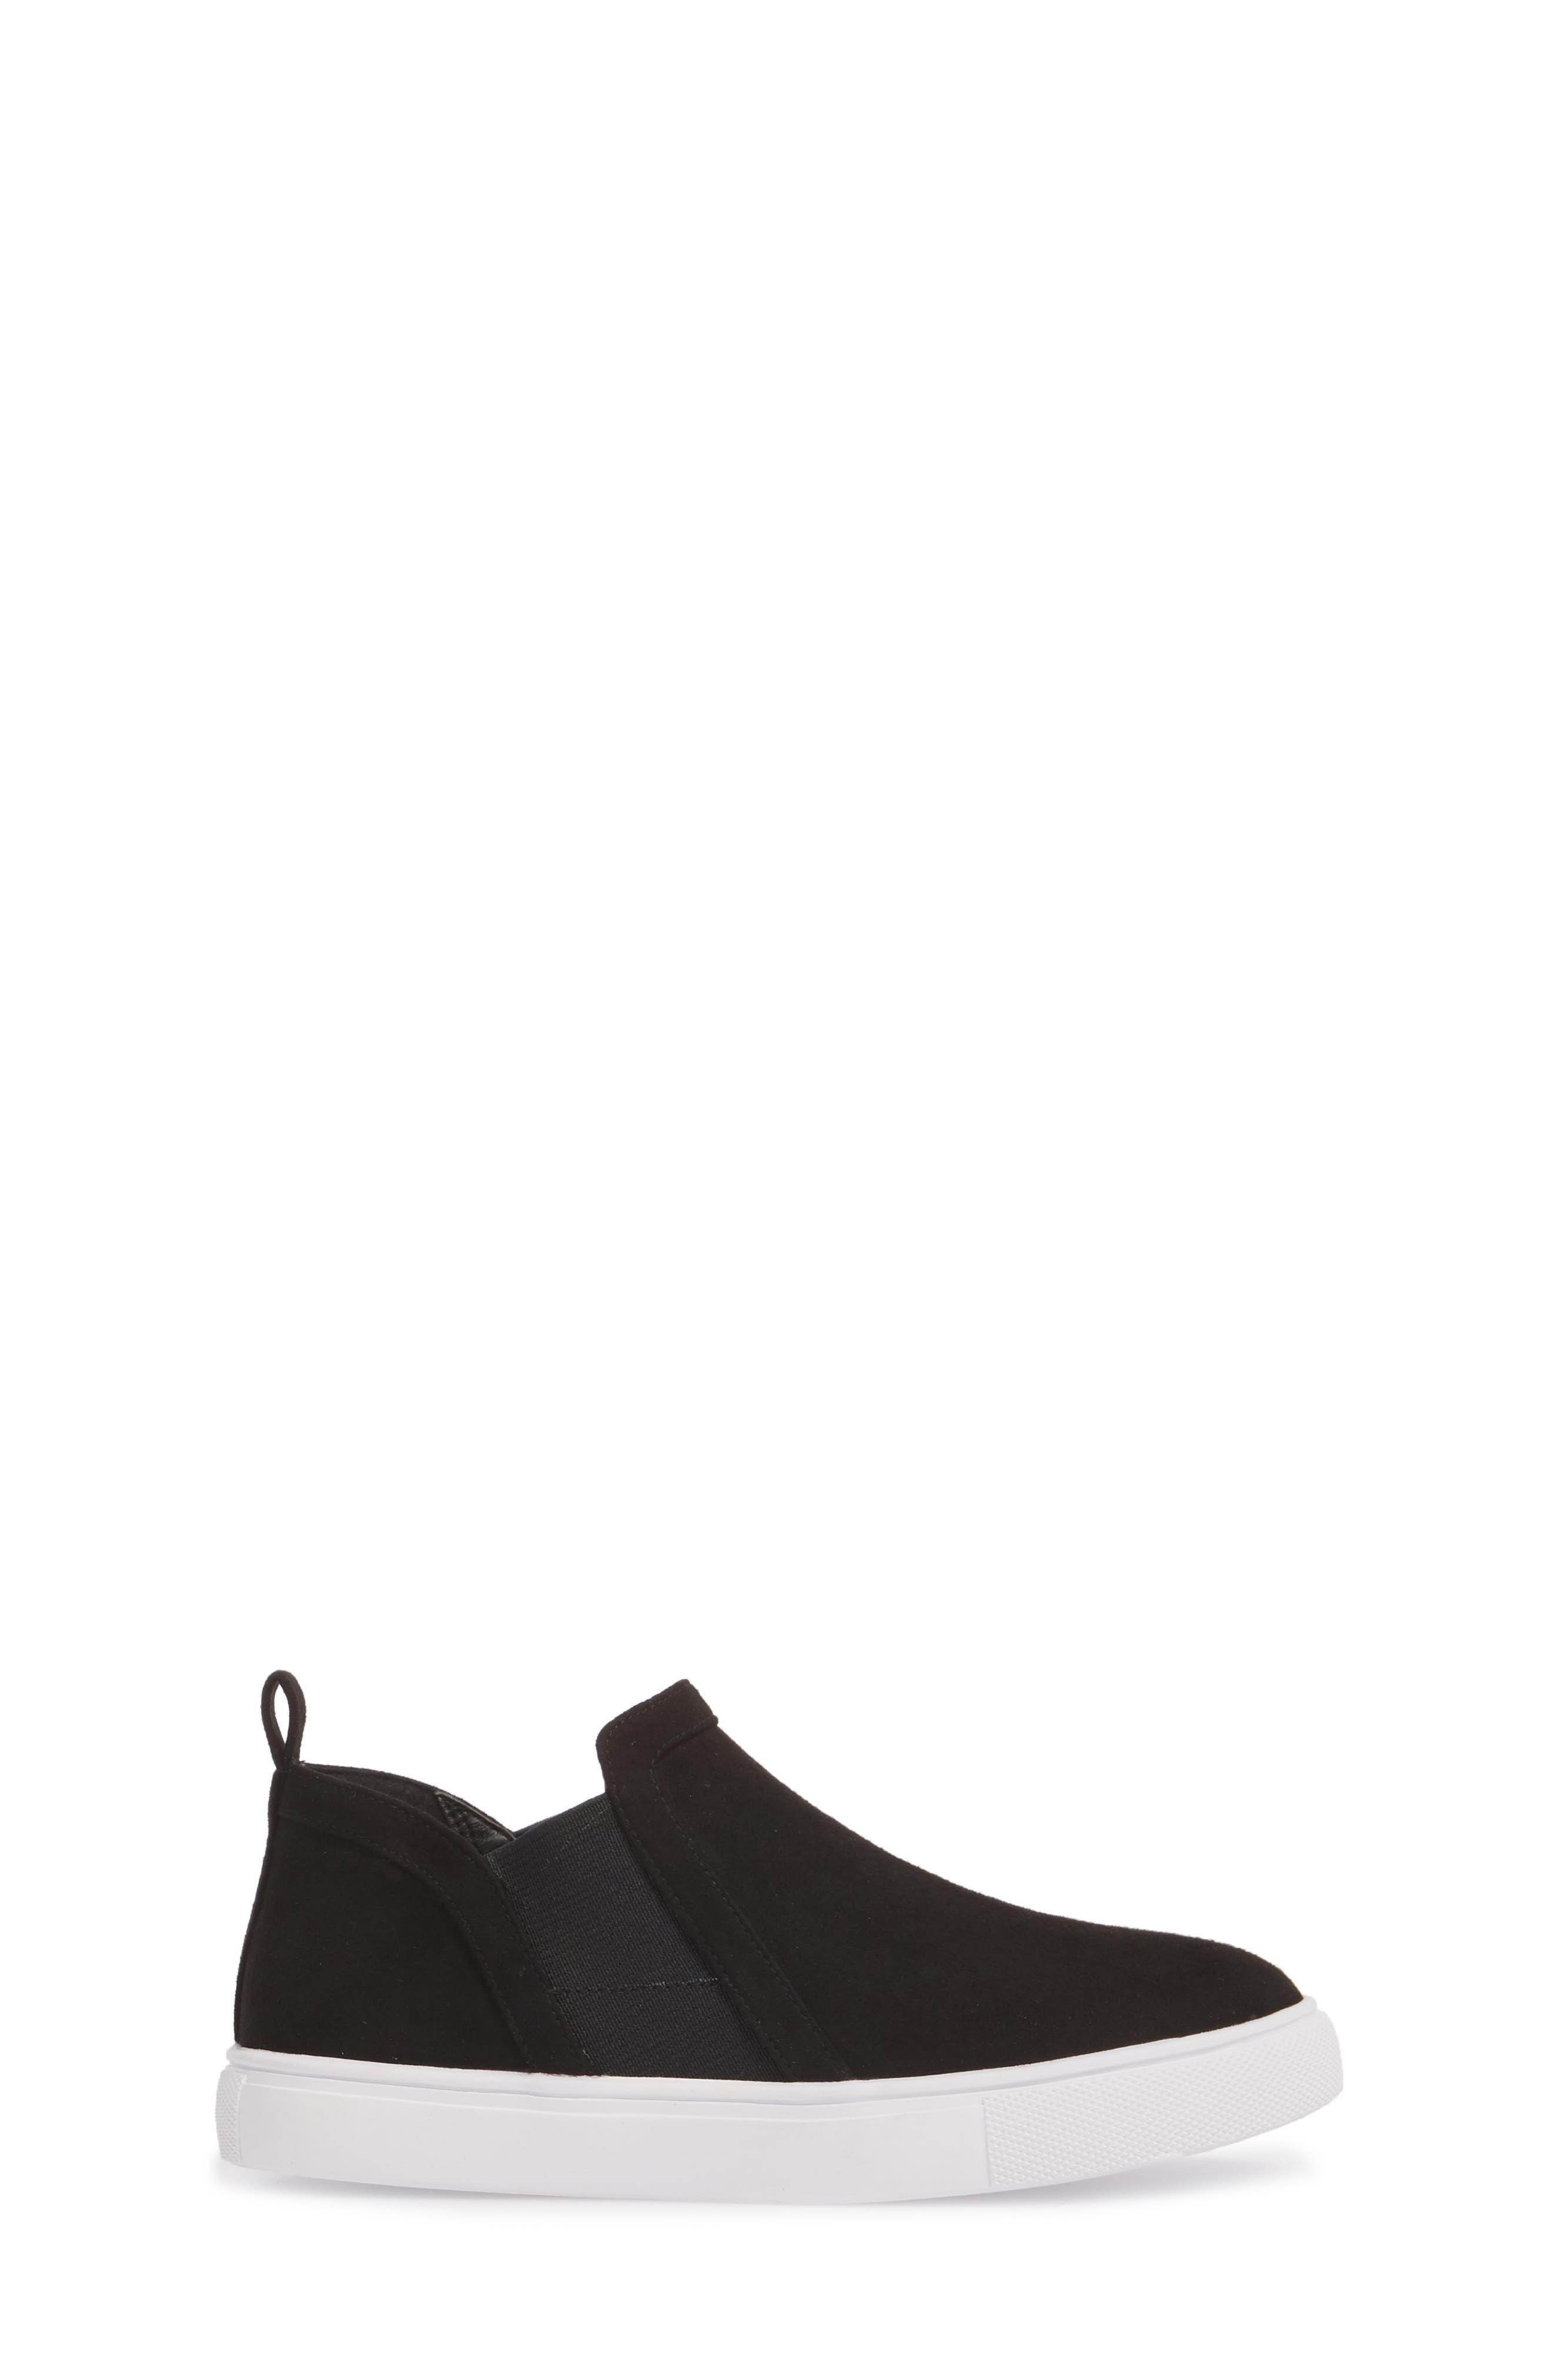 Scarlett Sneaker,                             Alternate thumbnail 3, color,                             BLACK FAUX SUEDE